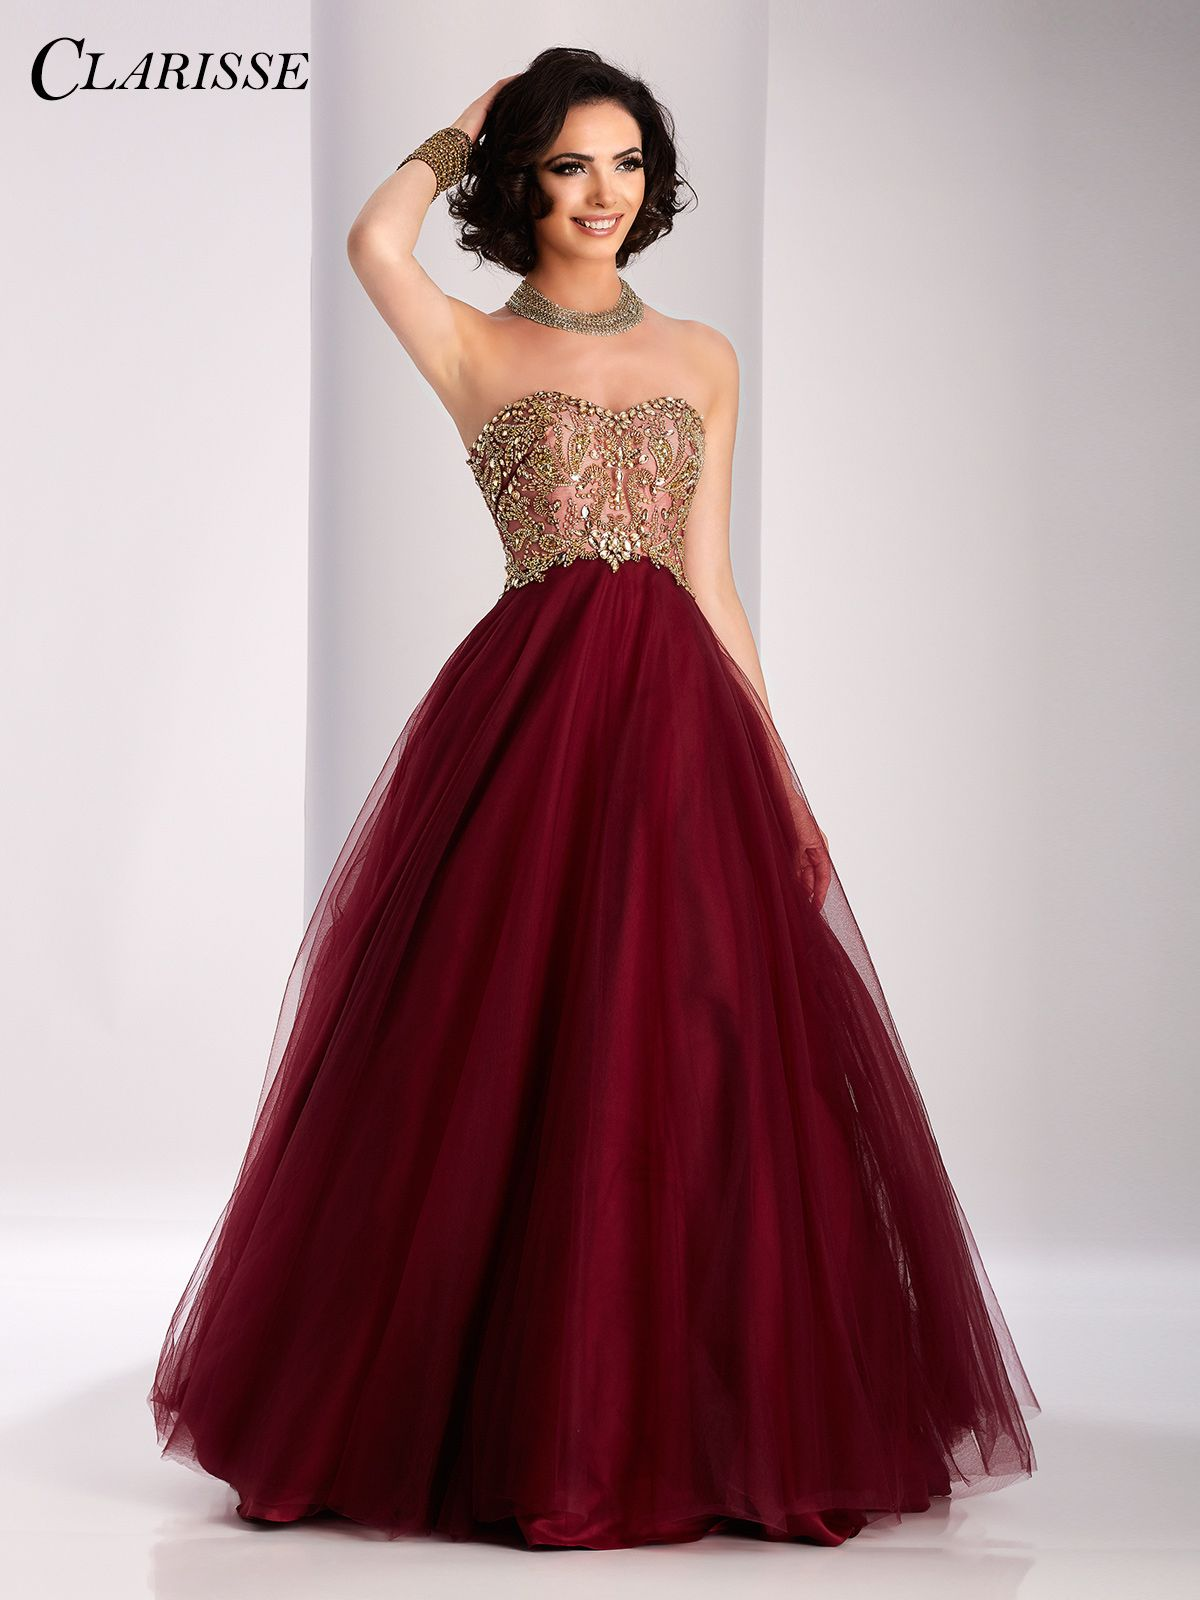 2 tone cocktail dresses pink